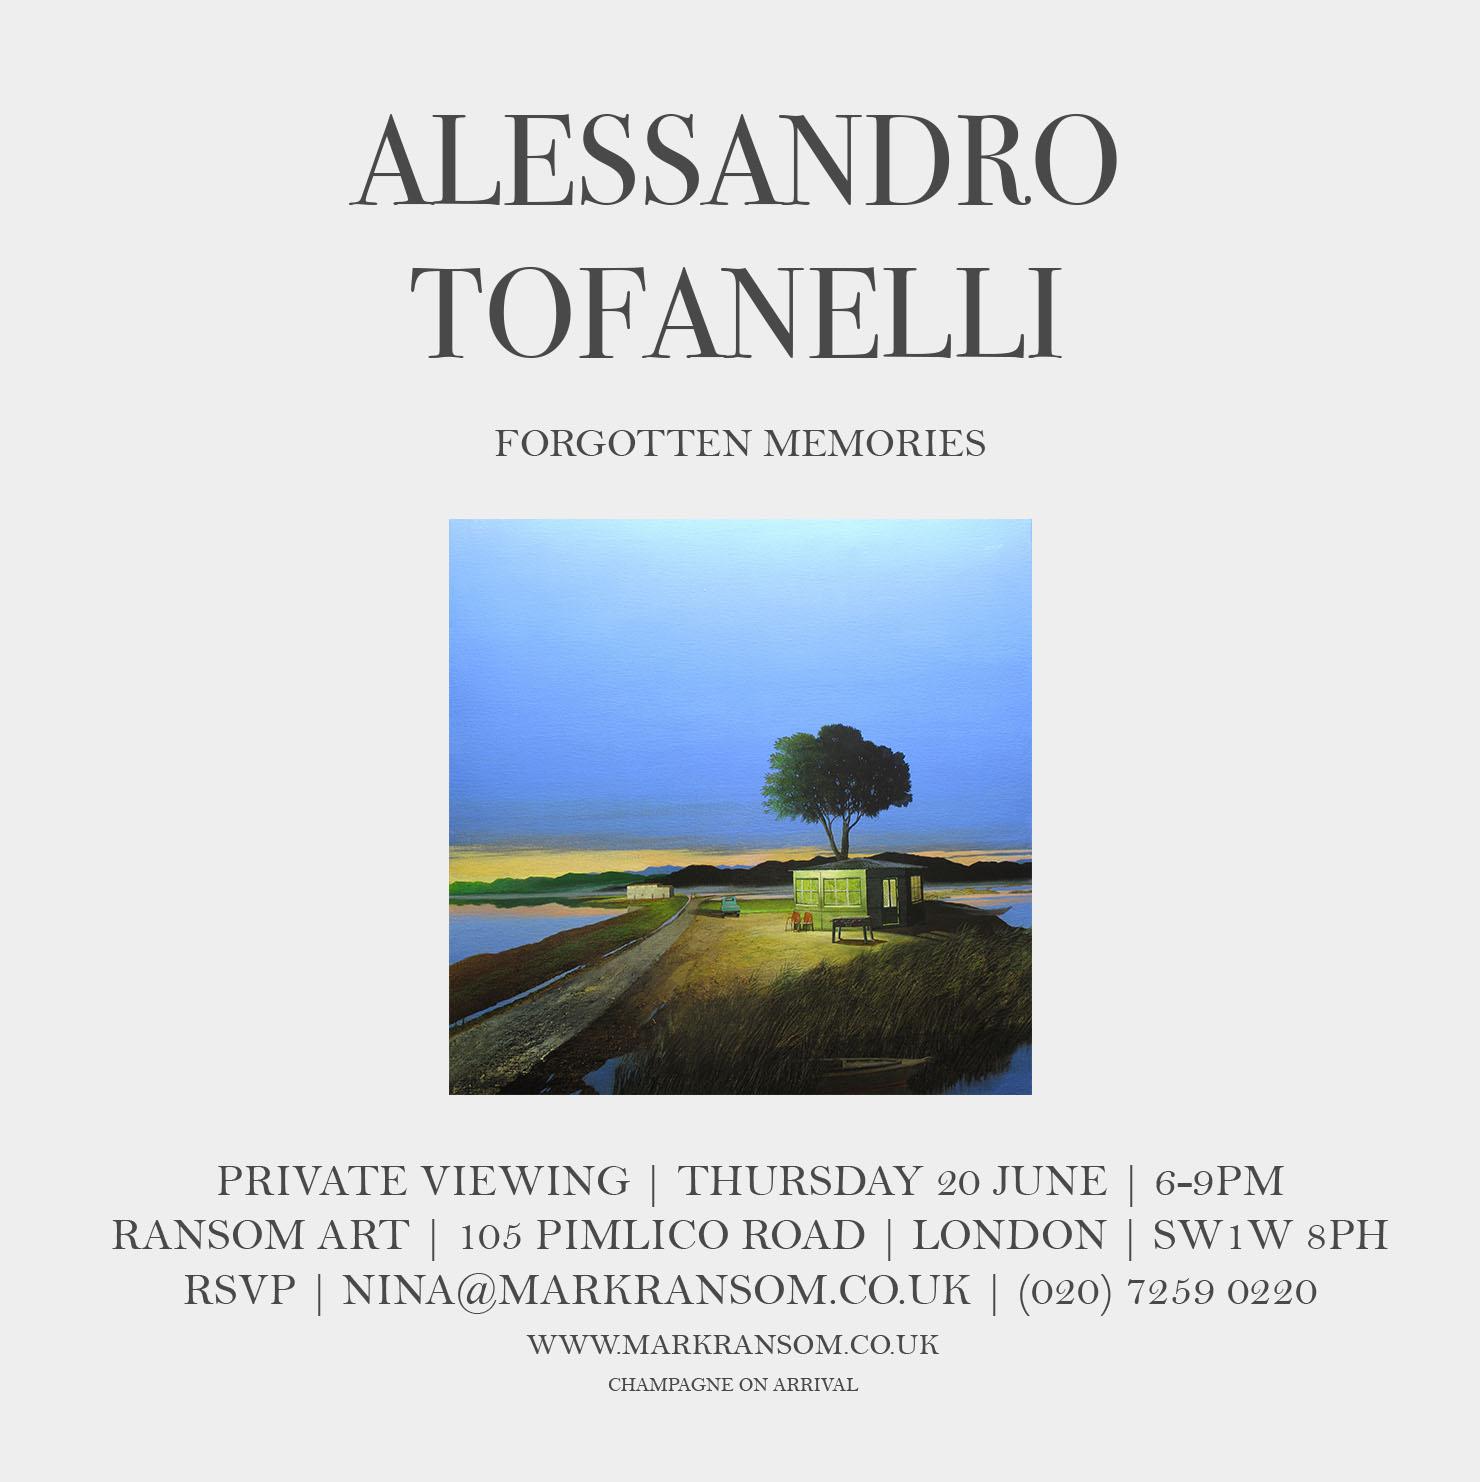 ALESSANDRO TOFANELLI - Forgotten Memories - invite (2).jpg